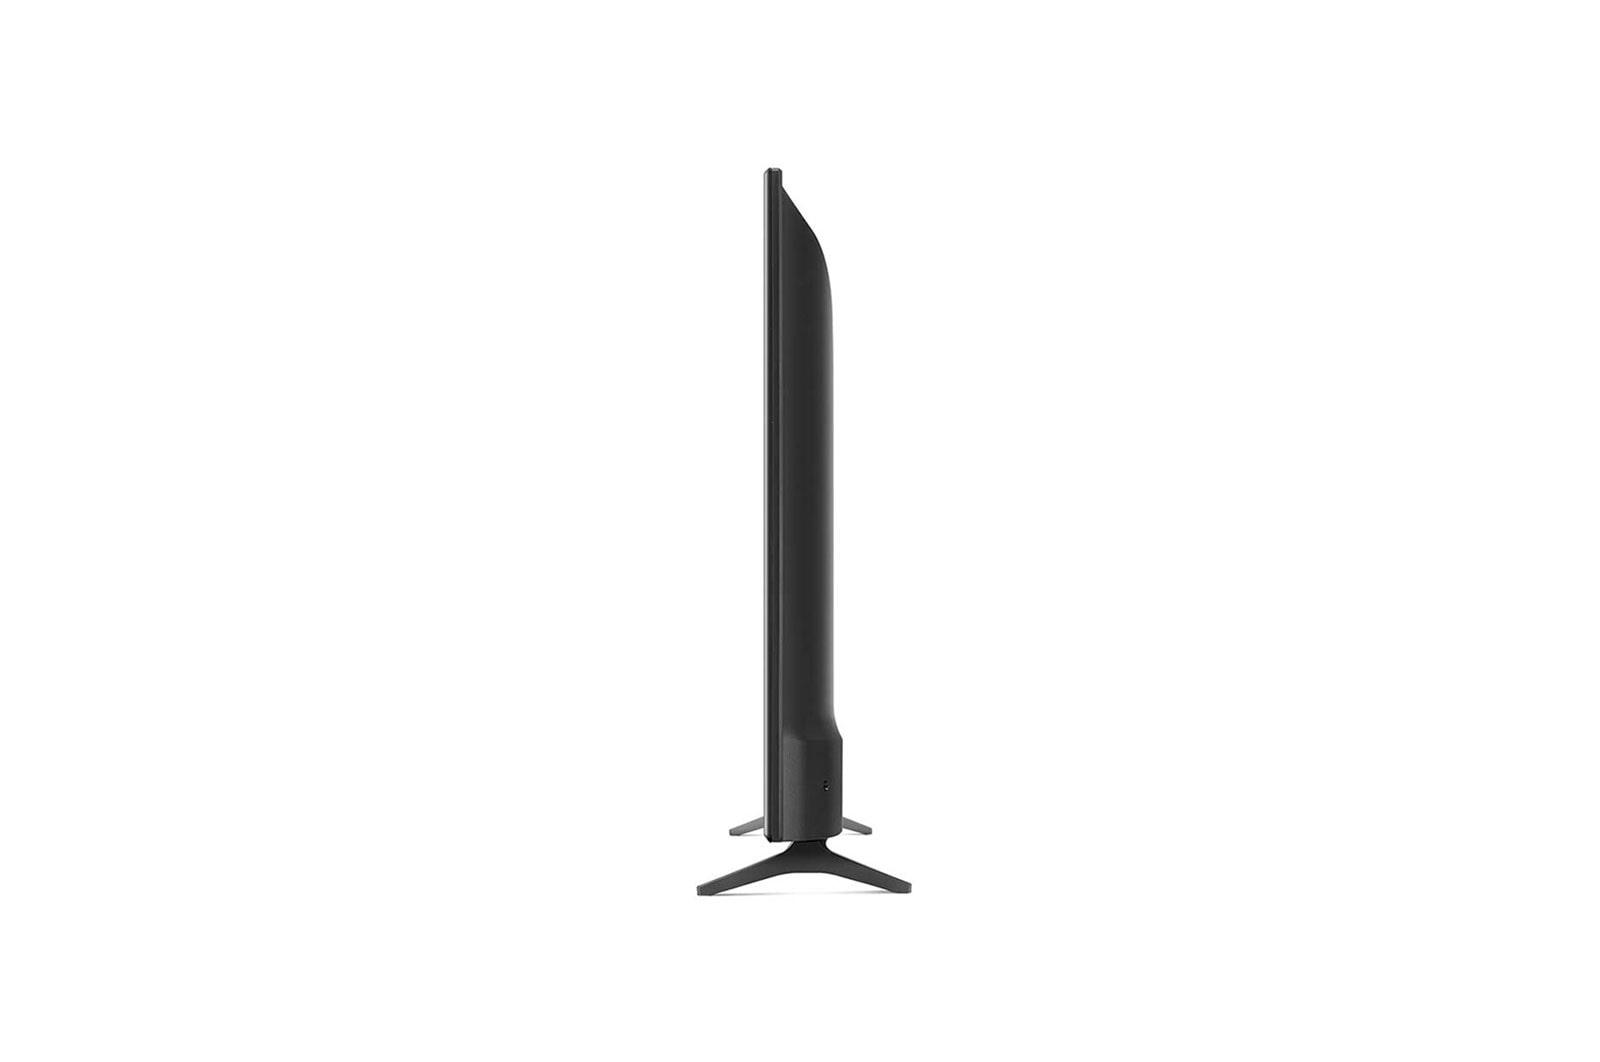 LG TV 55UM7290PTD 4